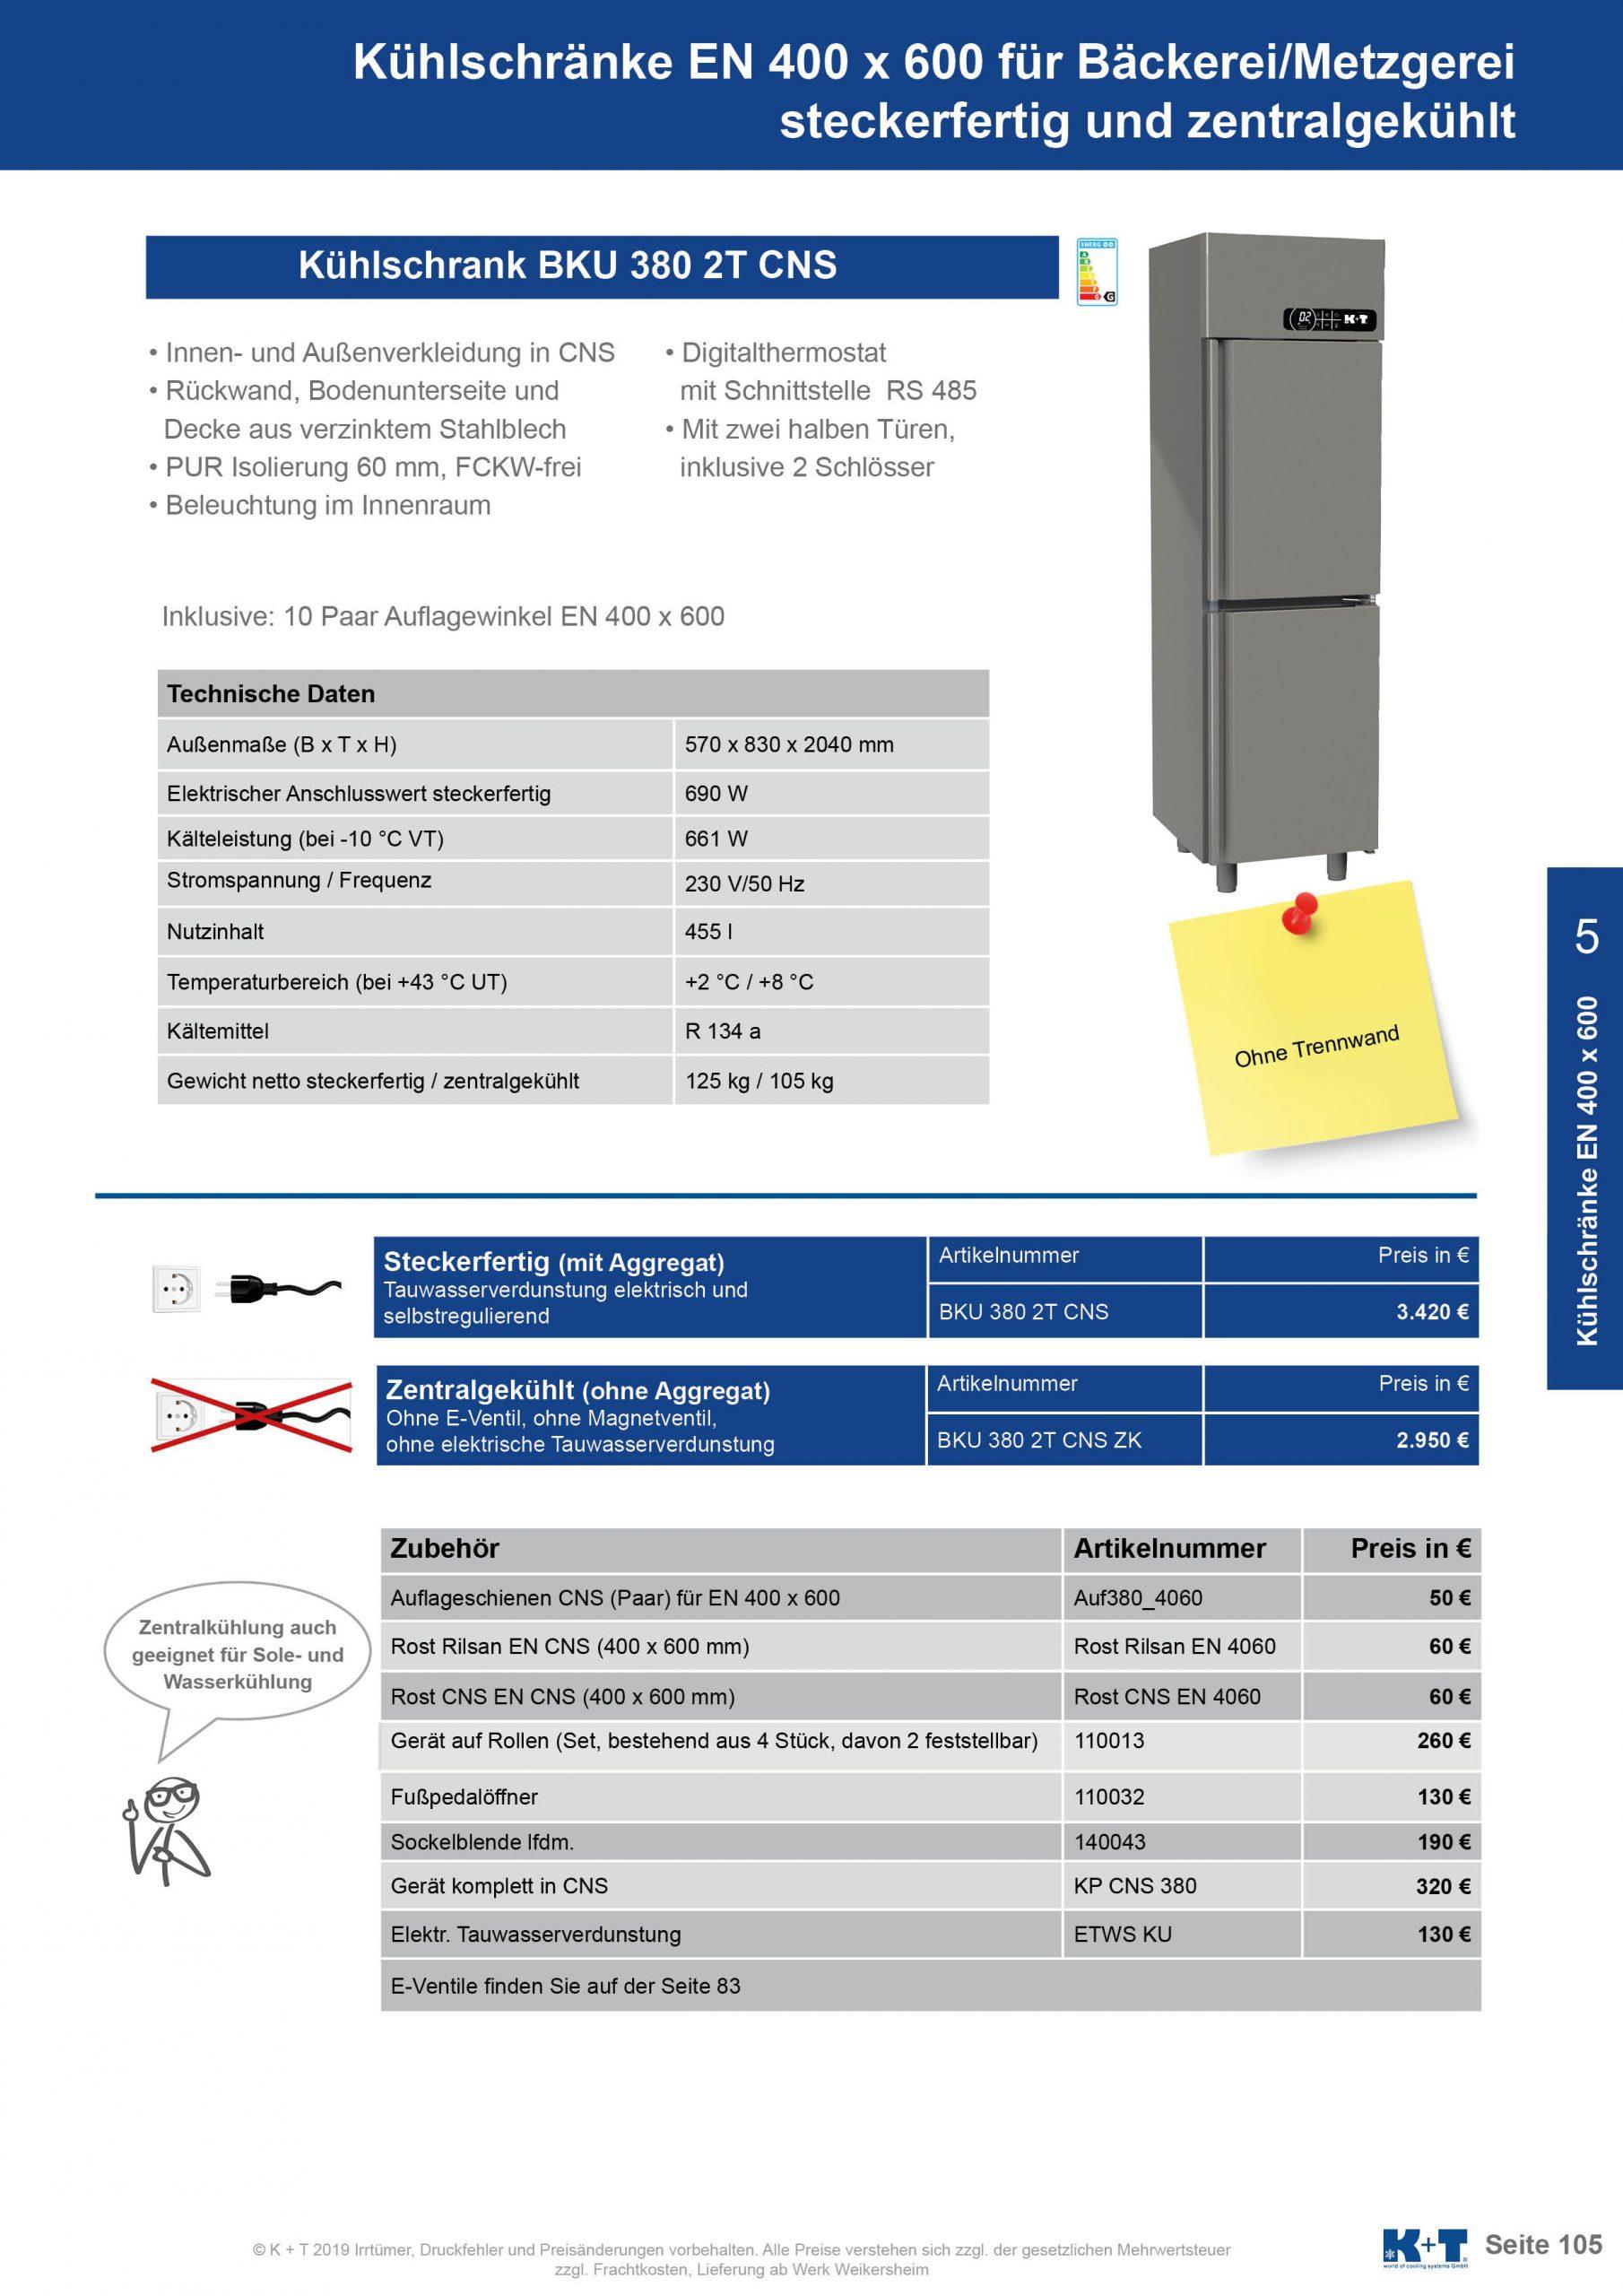 Kühlschränke Euronorm 400 x 600 Kühlschrank mit 2 halben Türen zentralgekühlt